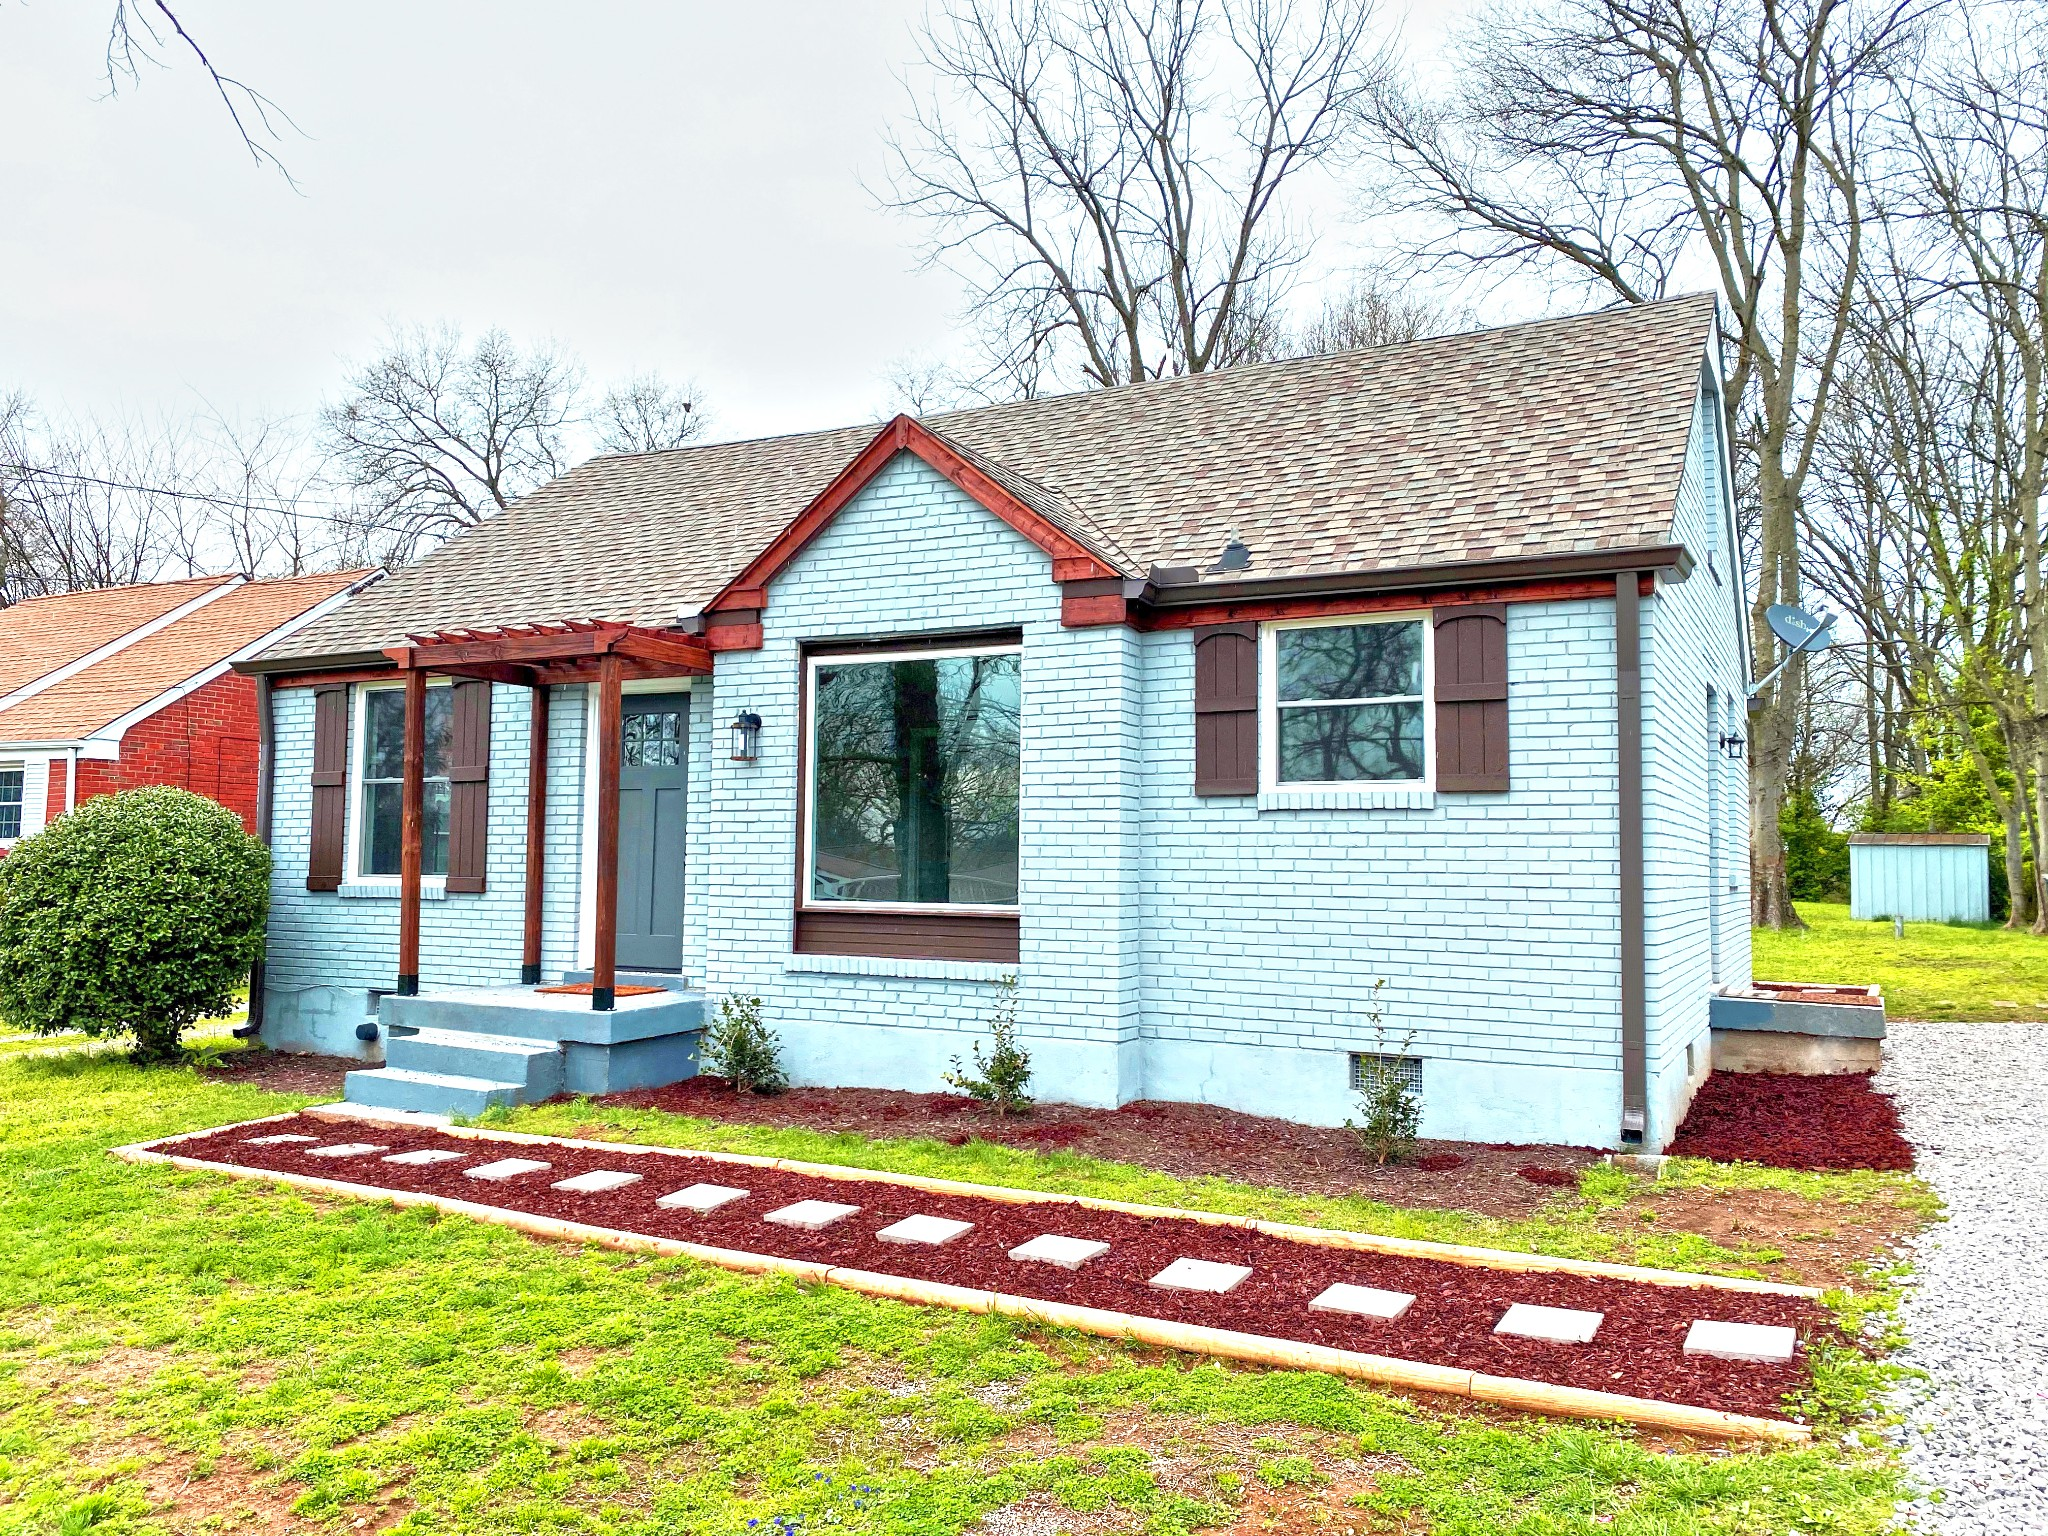 1307 McAlpine Ave, Nashville, TN 37216 - Nashville, TN real estate listing